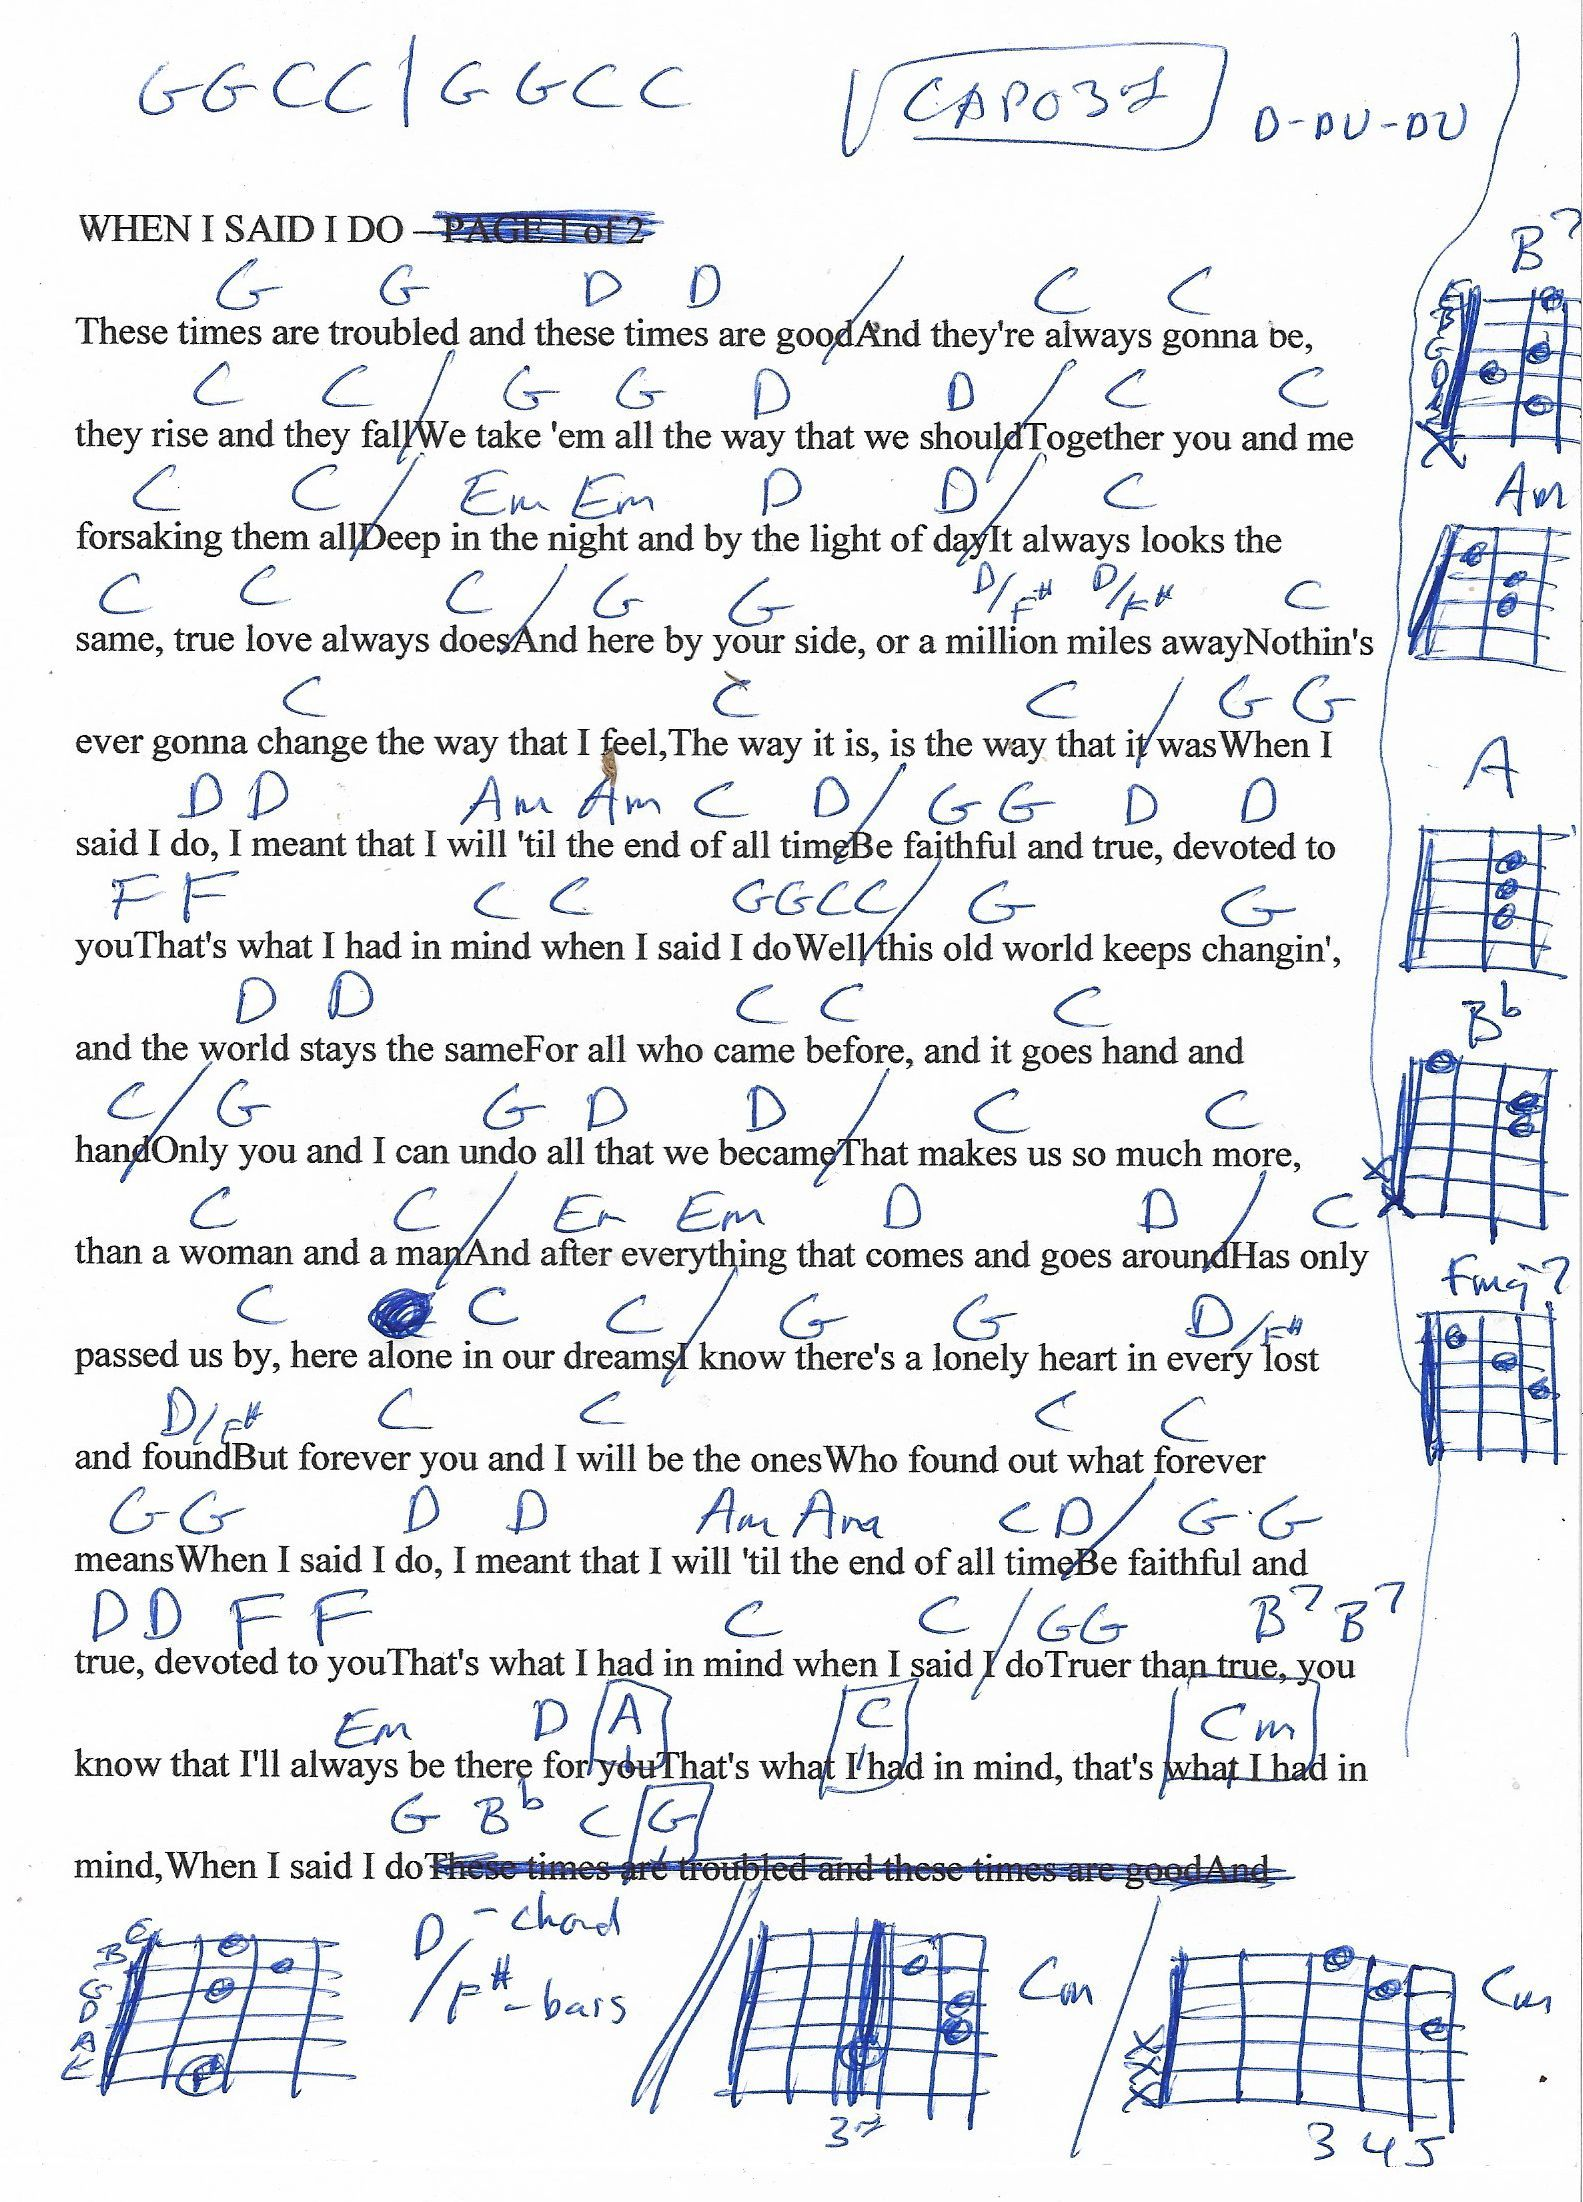 When I Said I Do (Clint Black) Guitar Chord Chart - Capo 3rd Fret